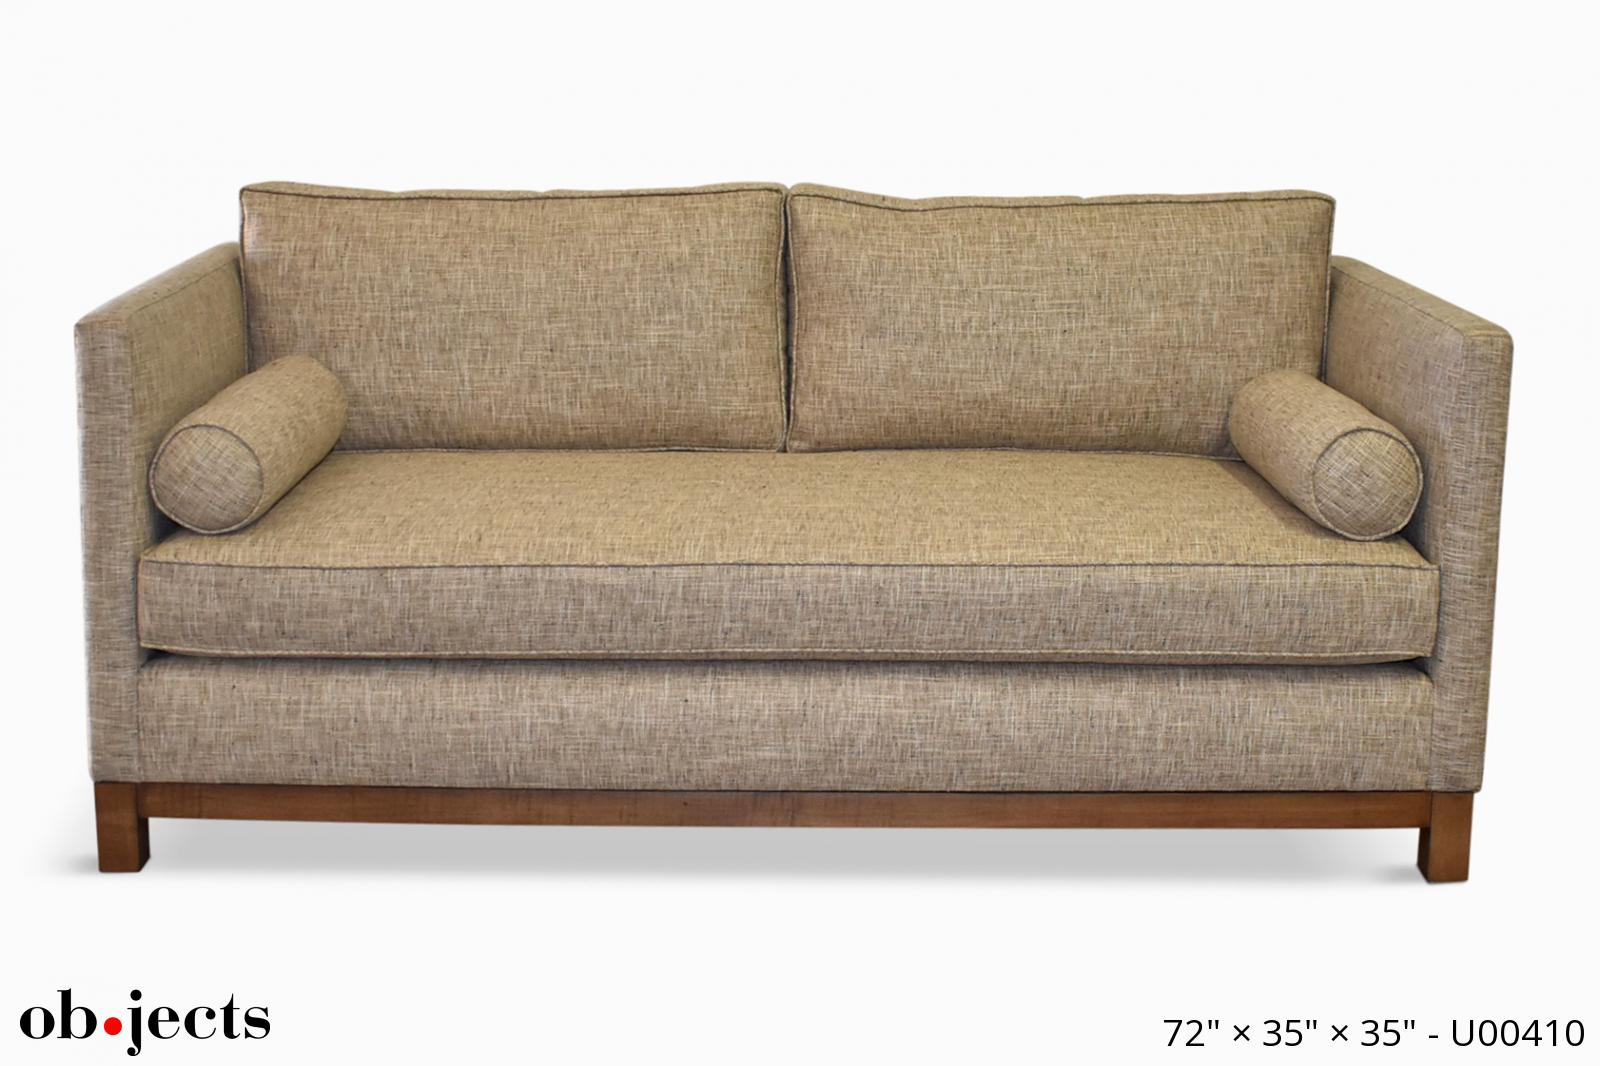 sofa oatmeal tuxedo w 2 bolster pillows